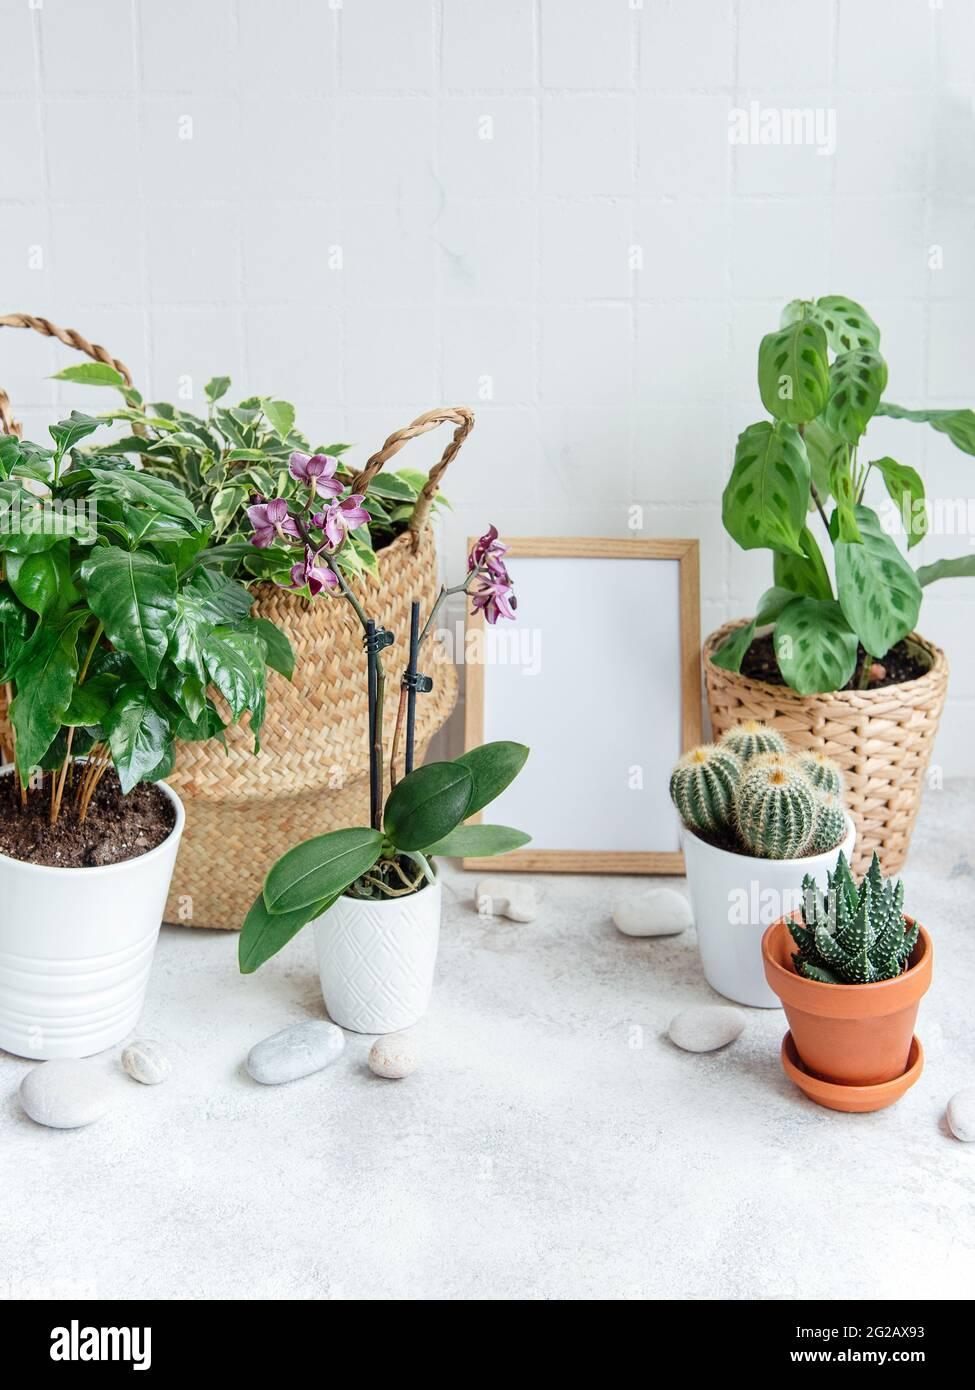 Habitación llena de un montón de plantas modernas, jardín con marco de póster falso. Foto de stock